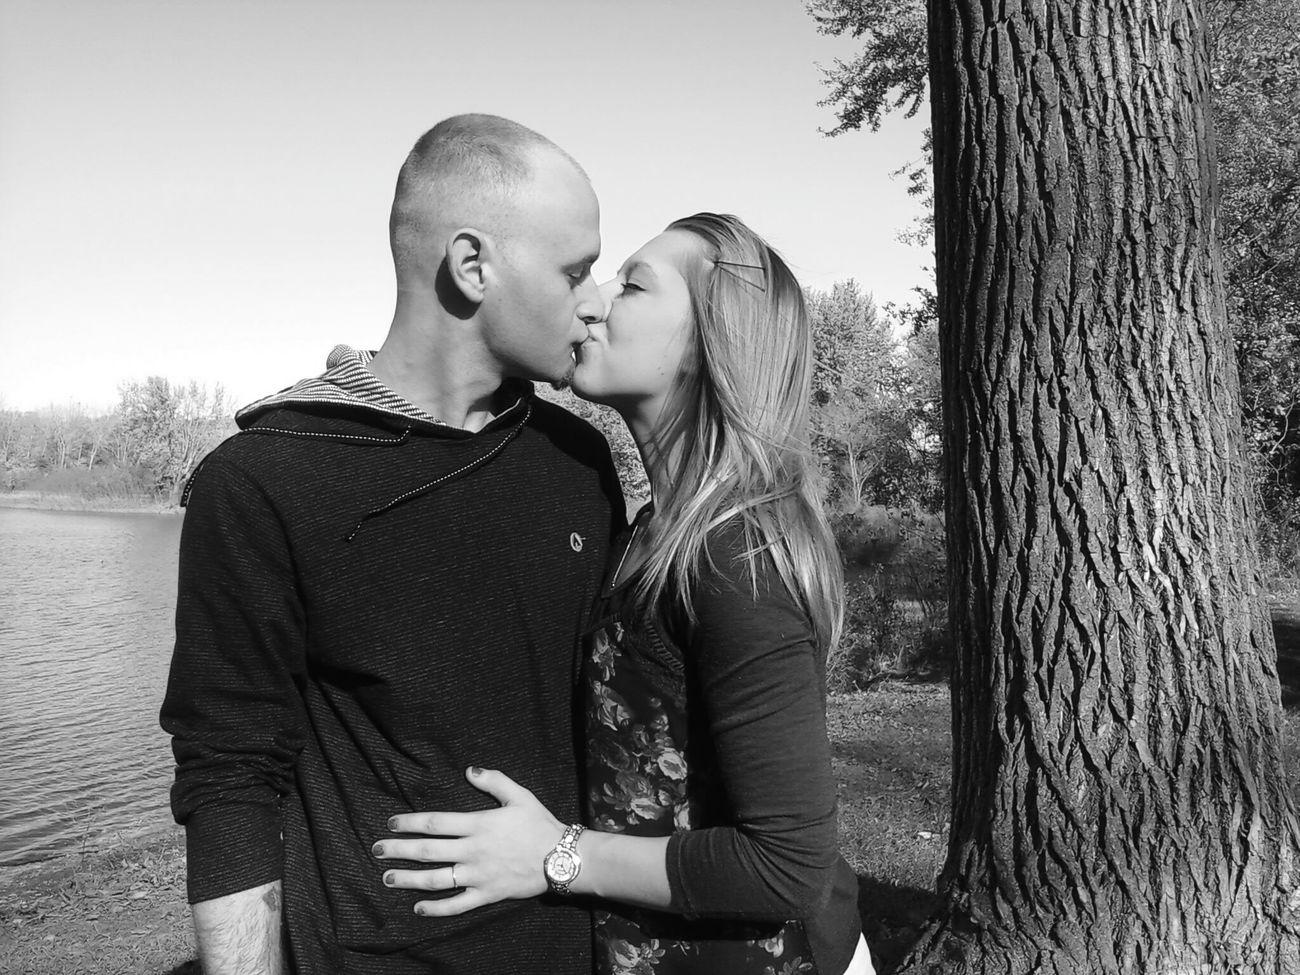 Loveisintheair😍💜😍💜🌸💎😊💜 Couple In Love Couple Photography blacknwhitephoto